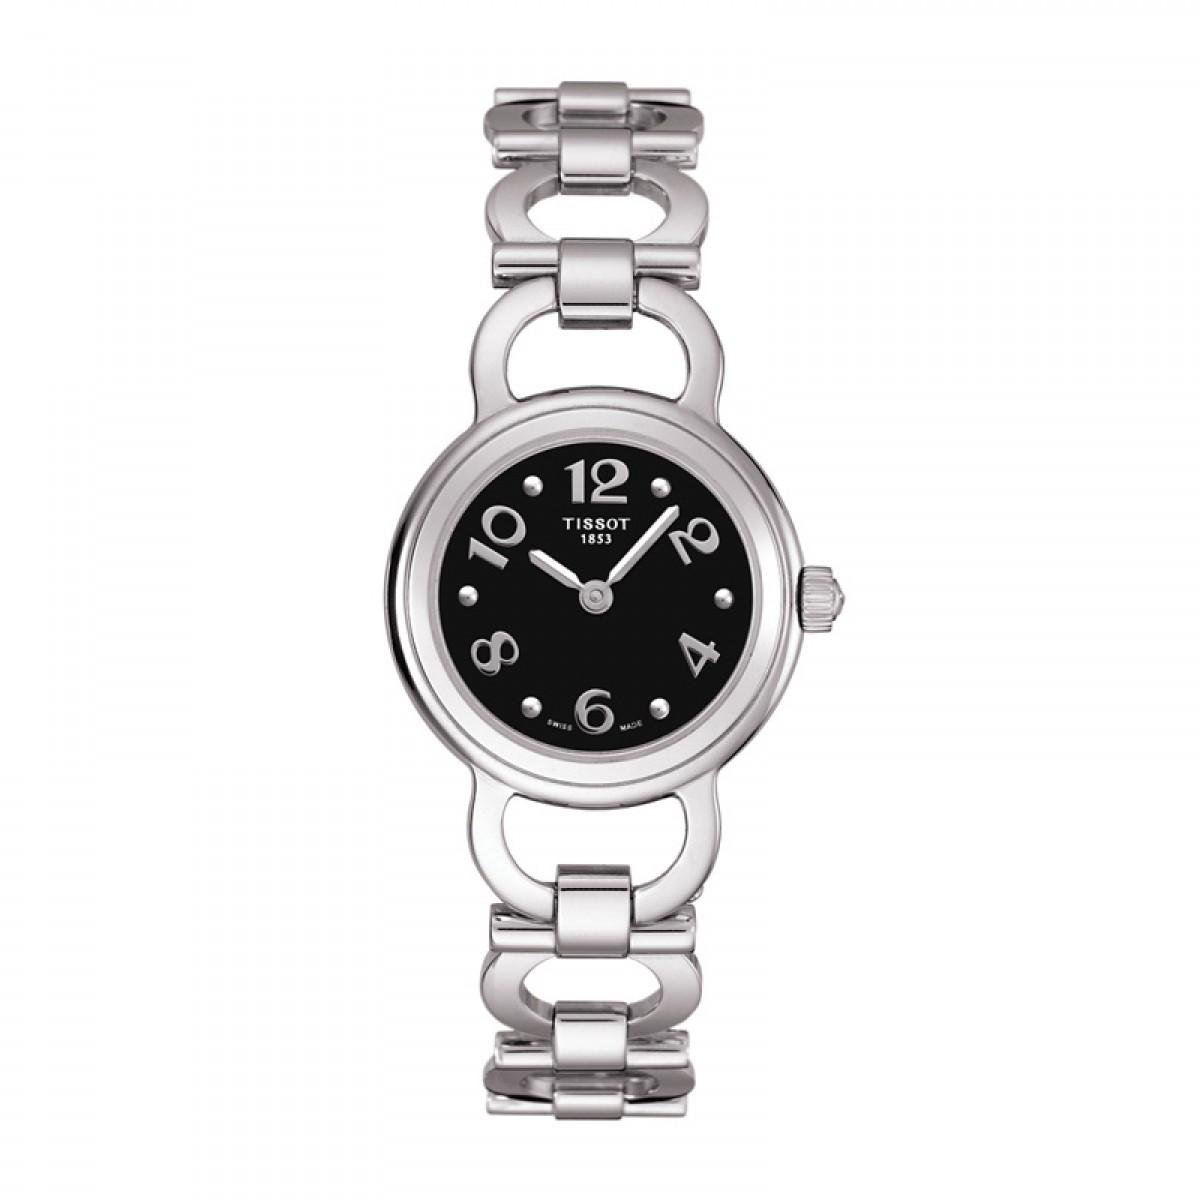 Часовник Tissot T029.009.11.057.00